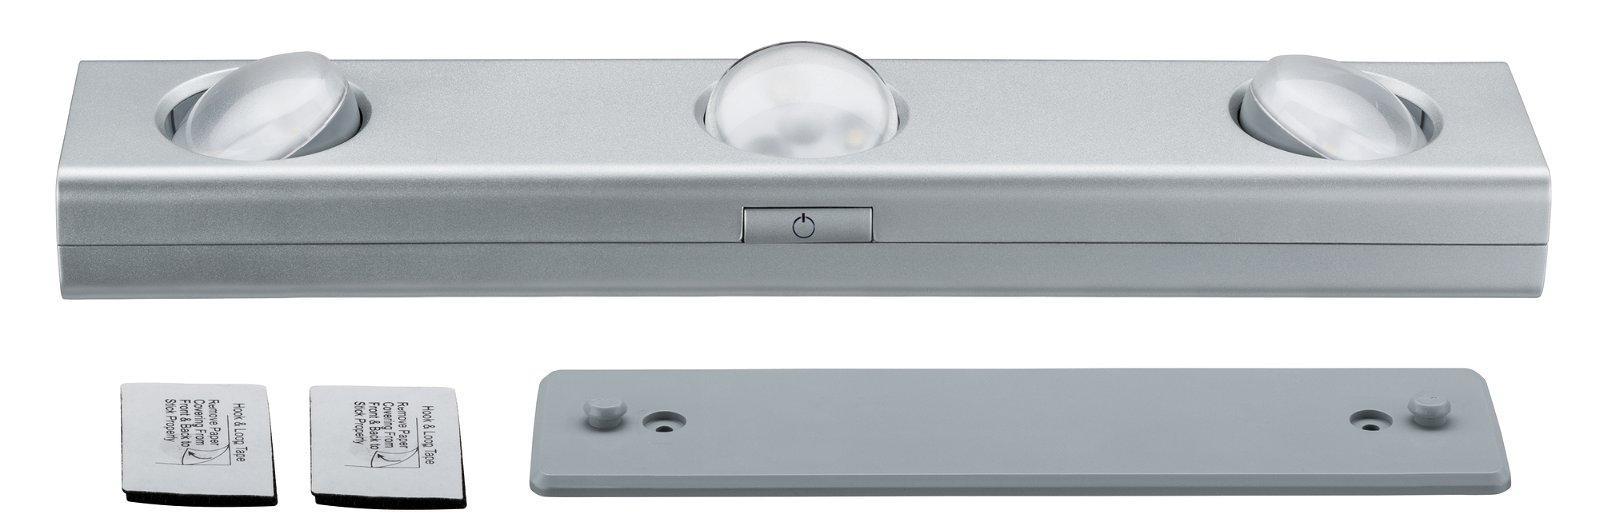 LED Unterschrankleuchte Jiggle 300x60mm 3x22lm 3000K Chrom matt